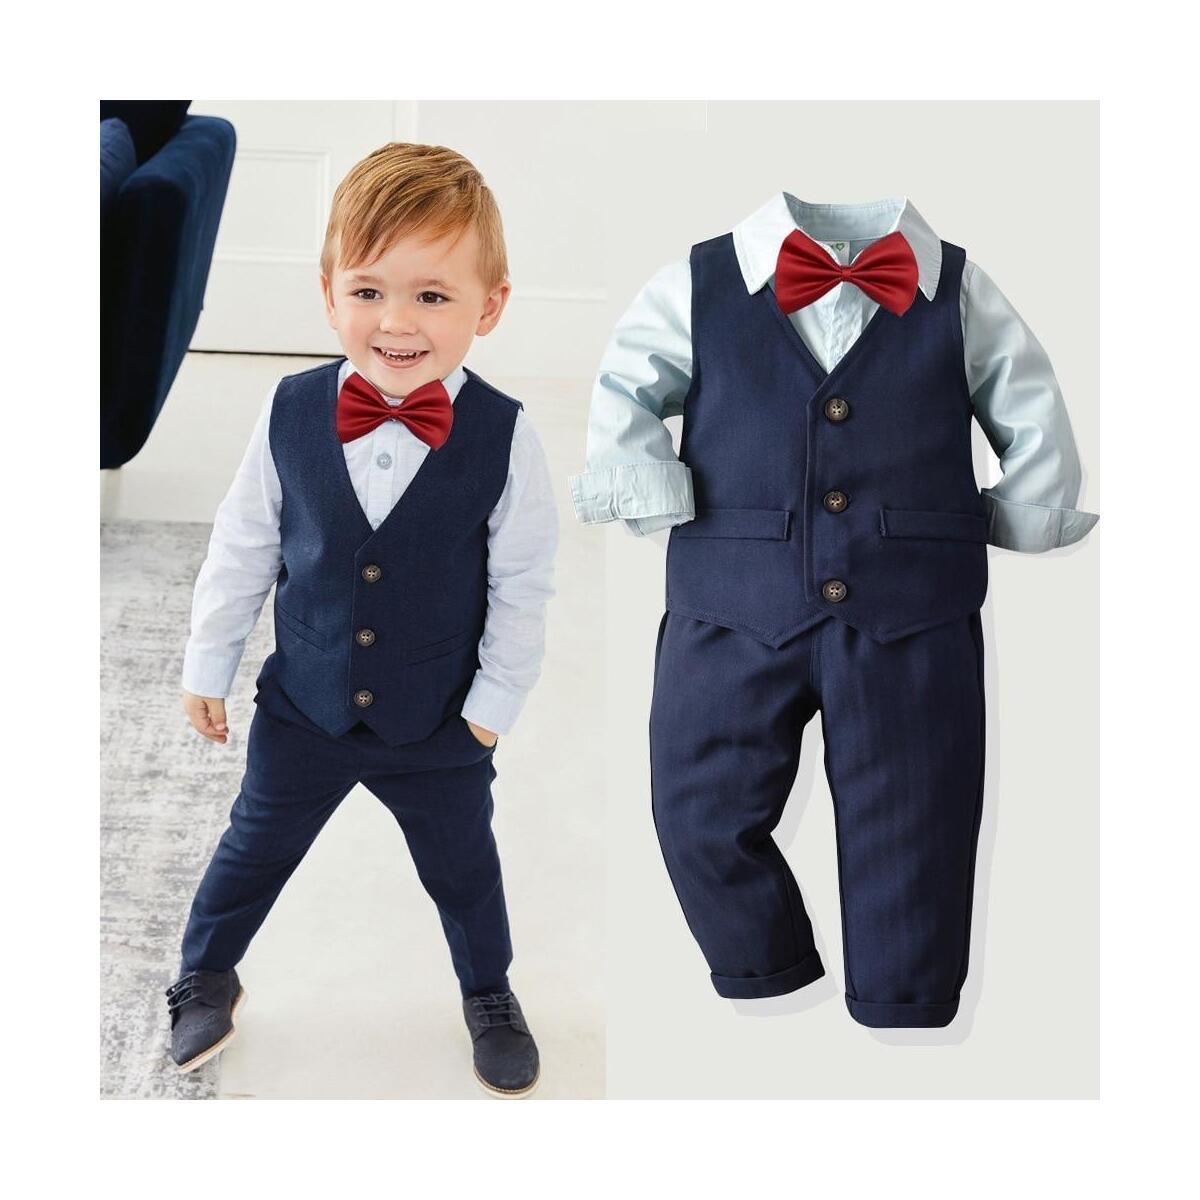 Kids Blazer Toddler Boy Suits Set Formal Suit For Boy Costume Kid Boys Wedding Suit Outfits Children Clothing Sets